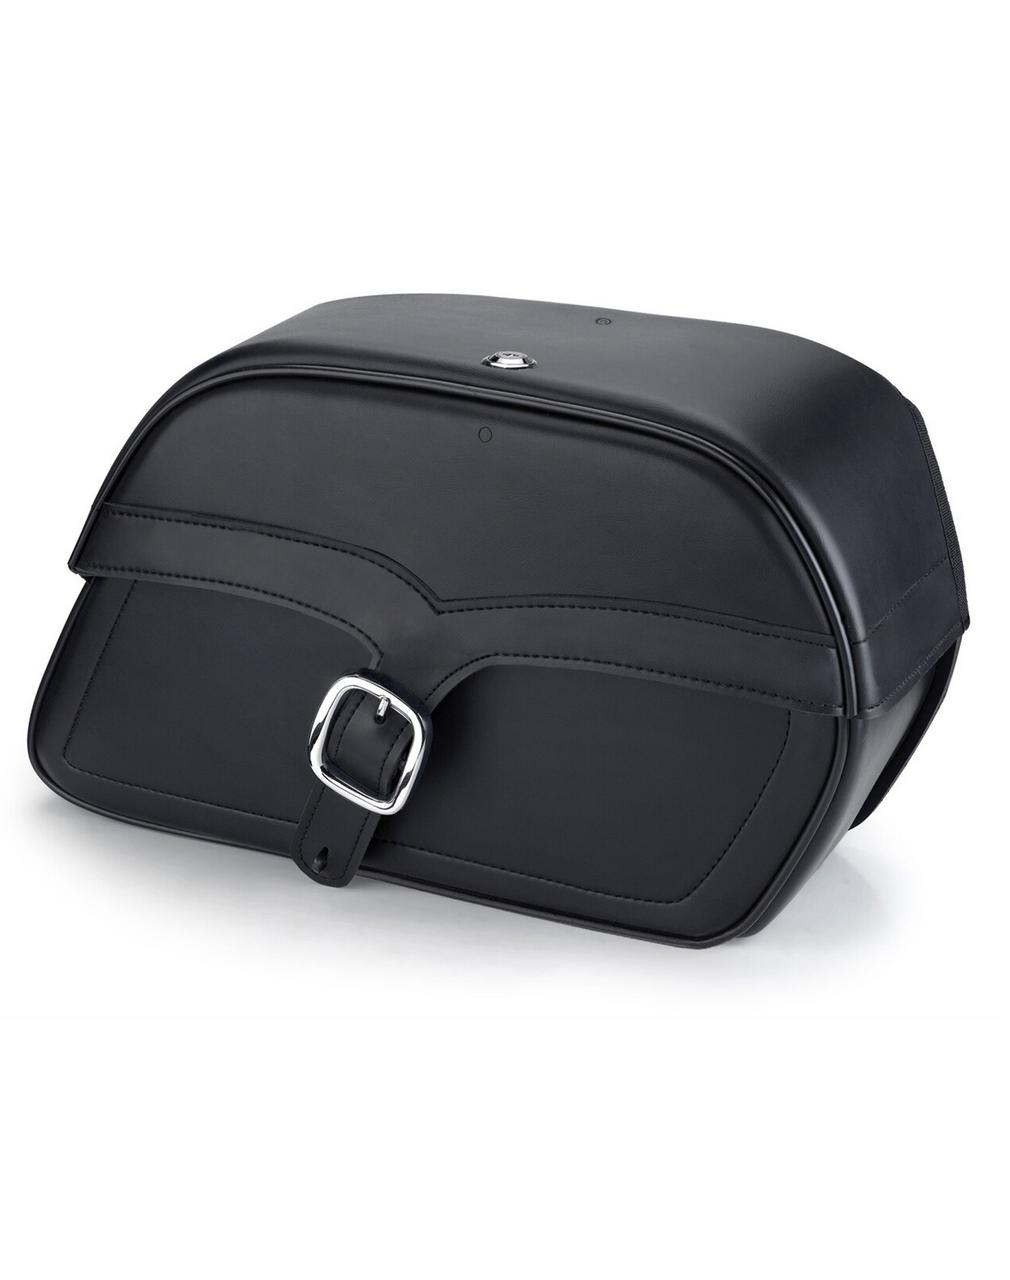 VikingBags Small Single Strap Honda Shadow Aero ABS VT750CS Leather Motorcycle Saddlebags bag view